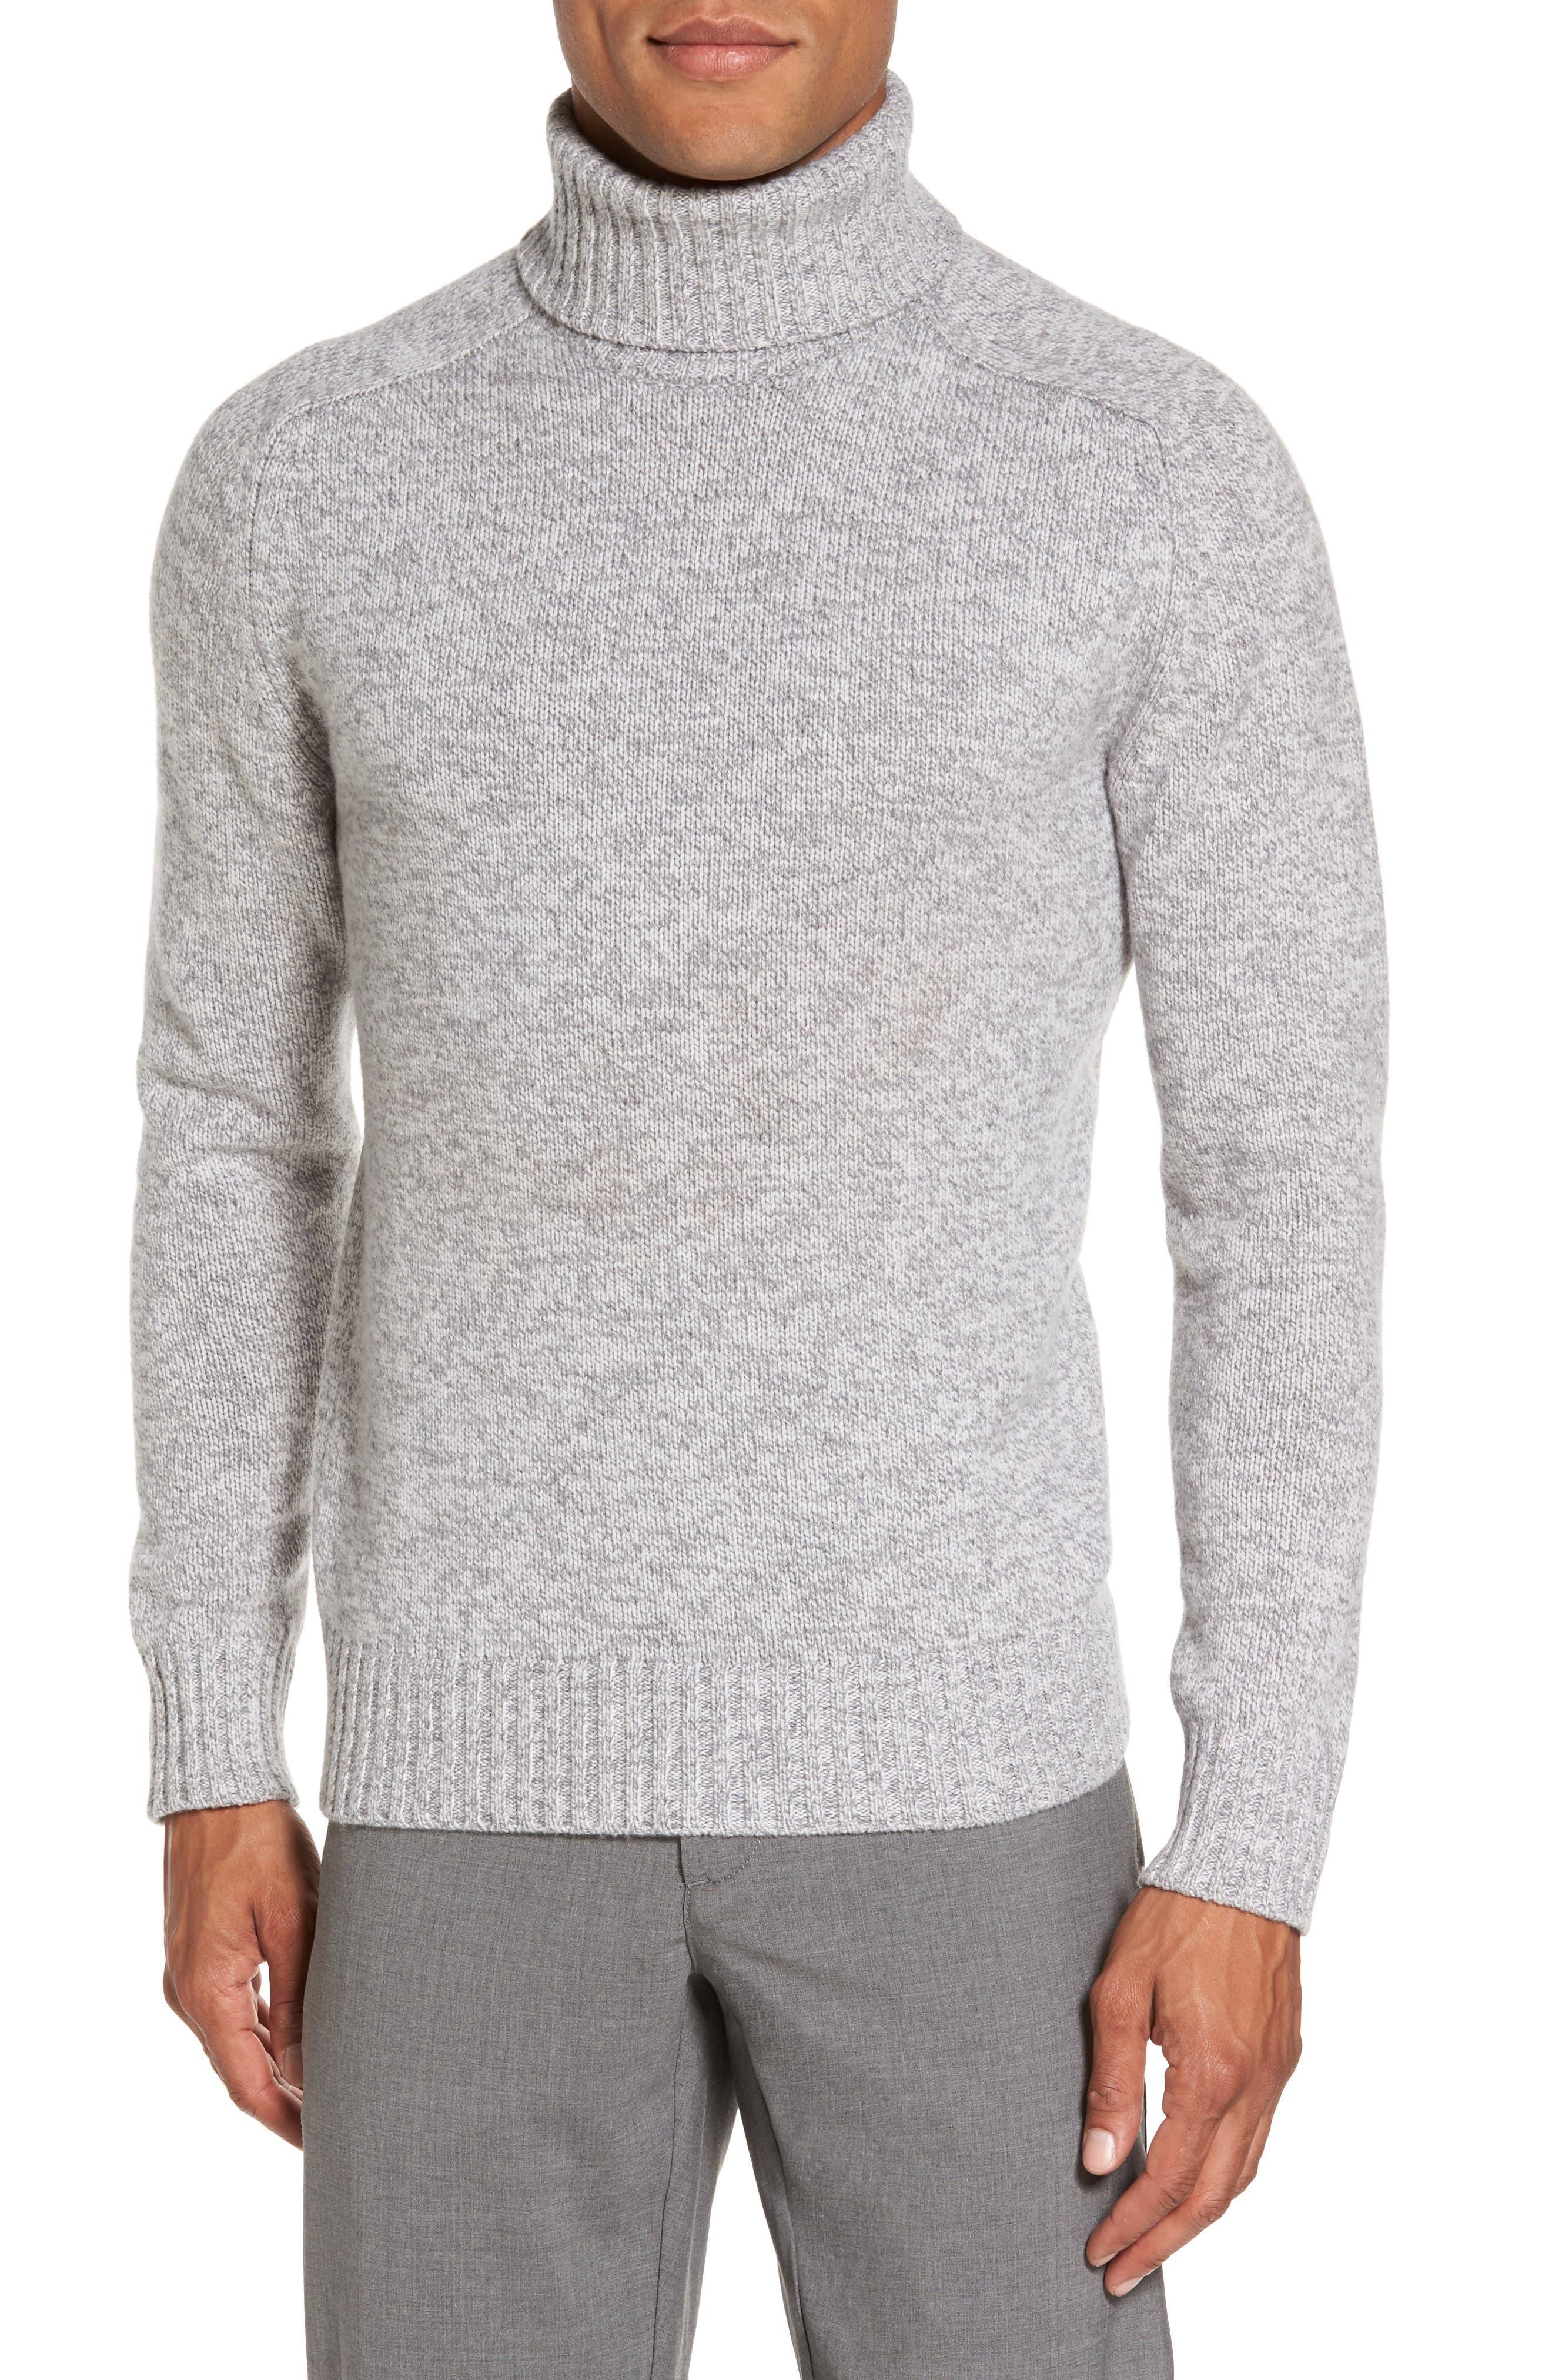 Marled Turtleneck Sweater,                         Main,                         color, 054